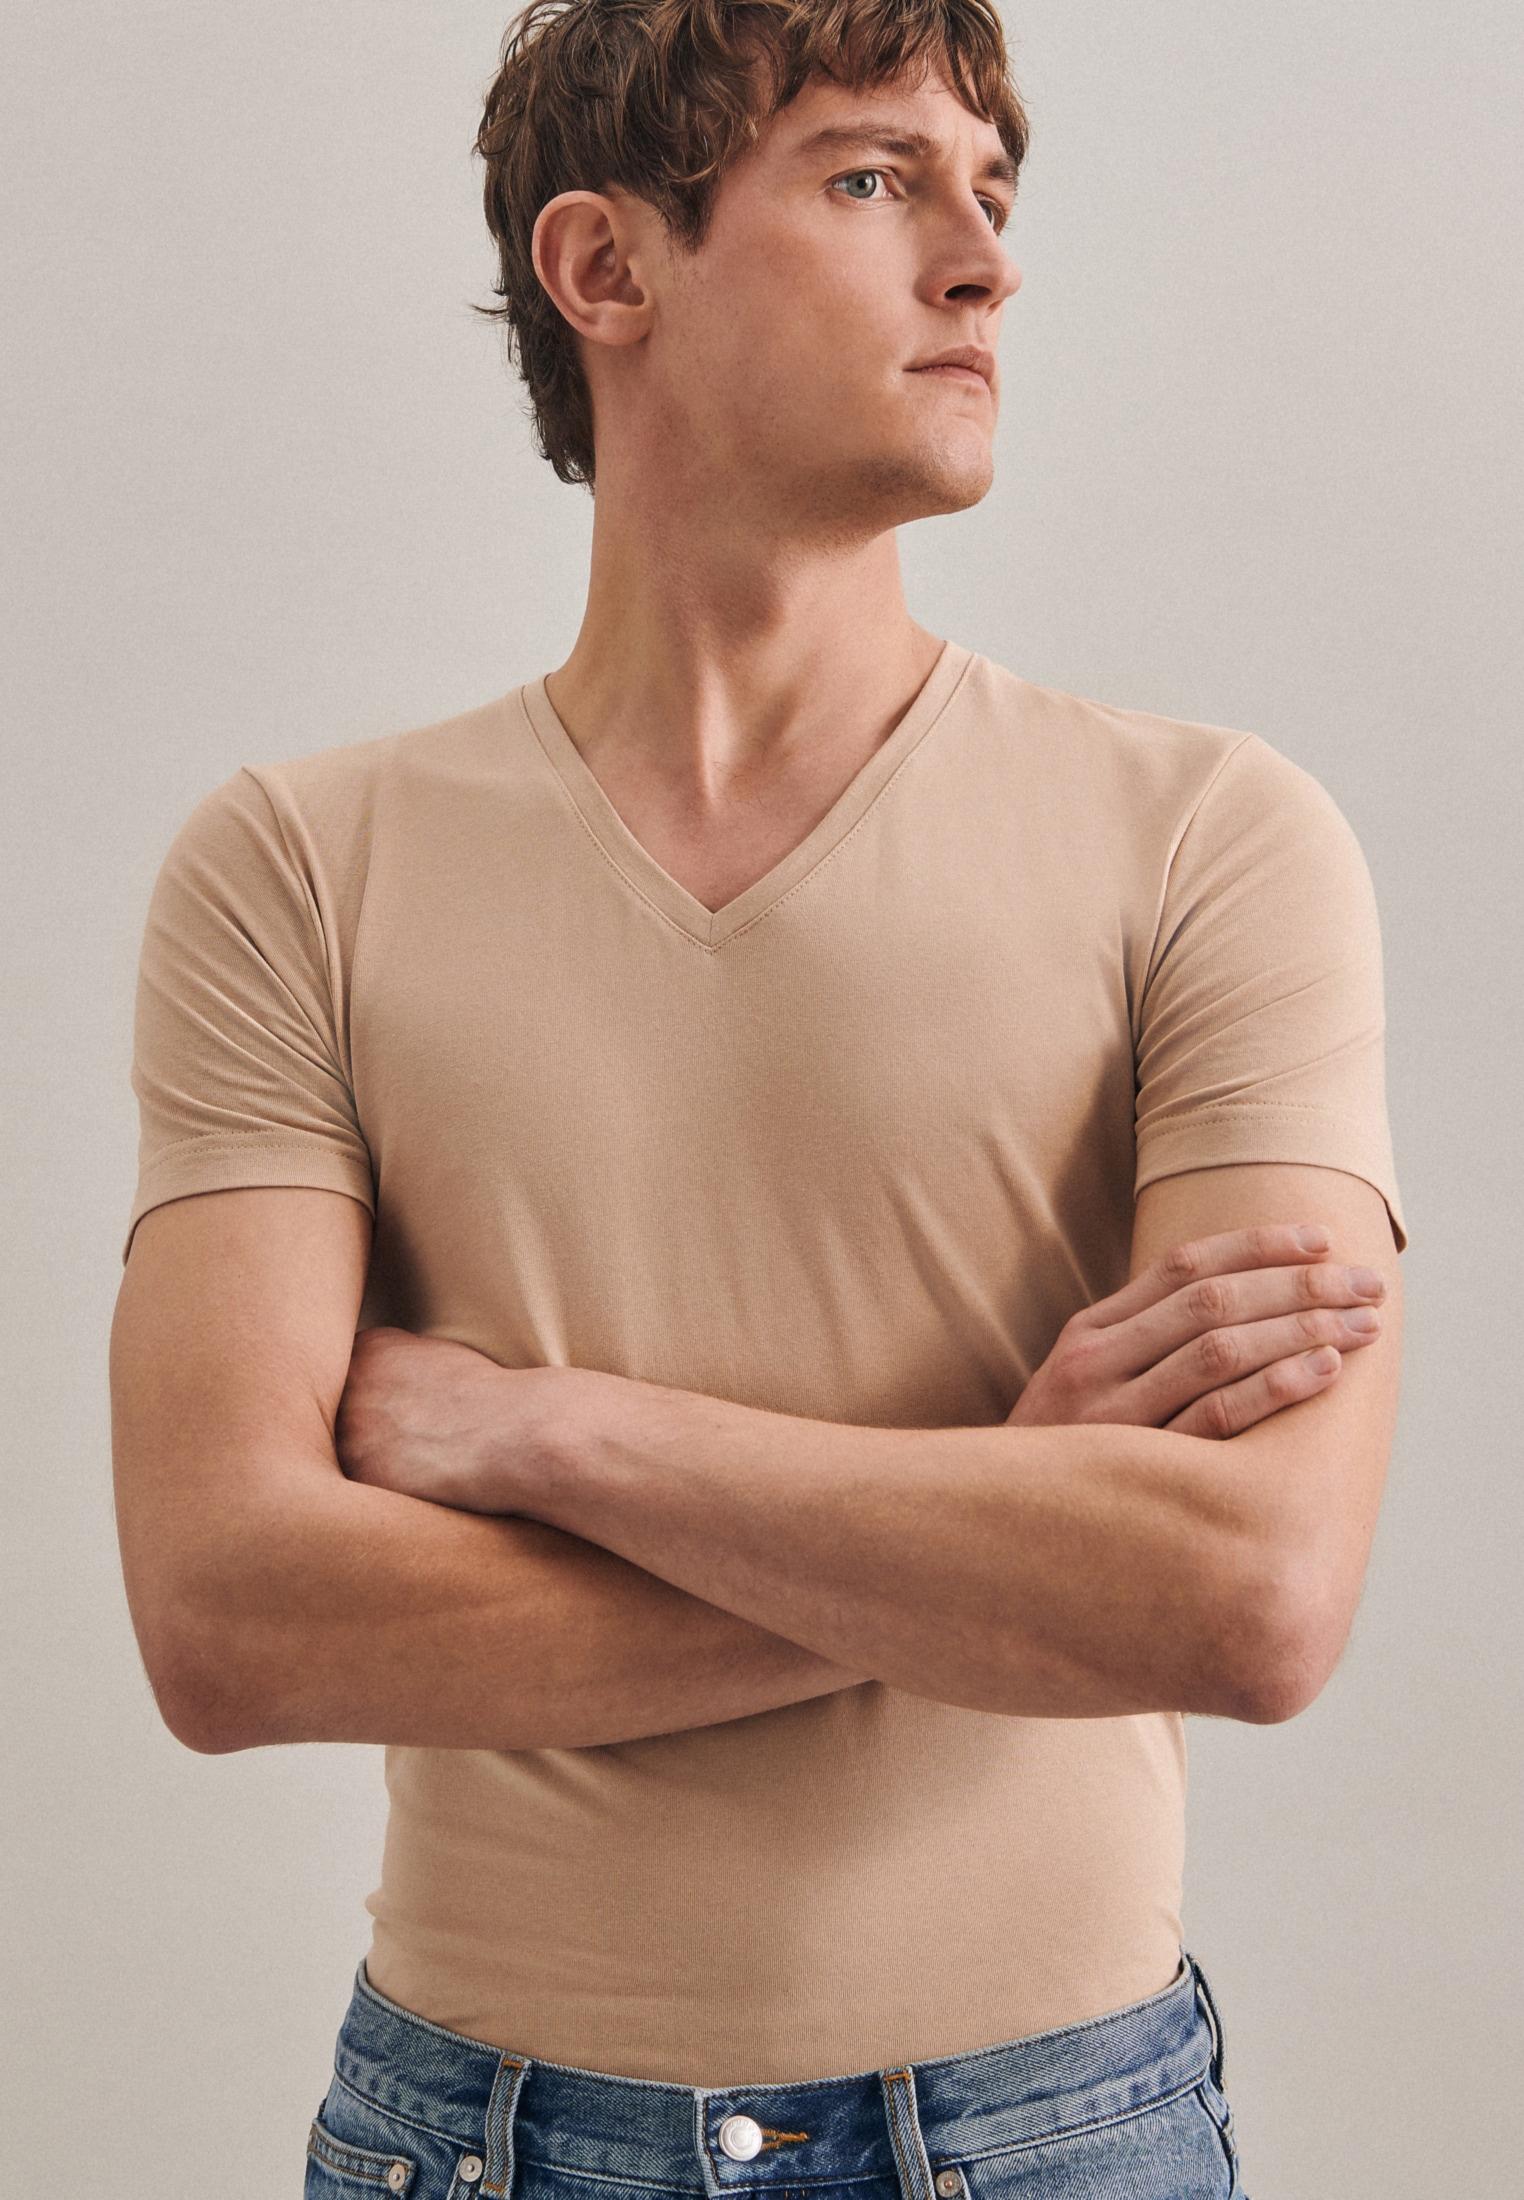 seidensticker -  T-Shirt Schwarze Rose, Kurzarm V-Neck Uni